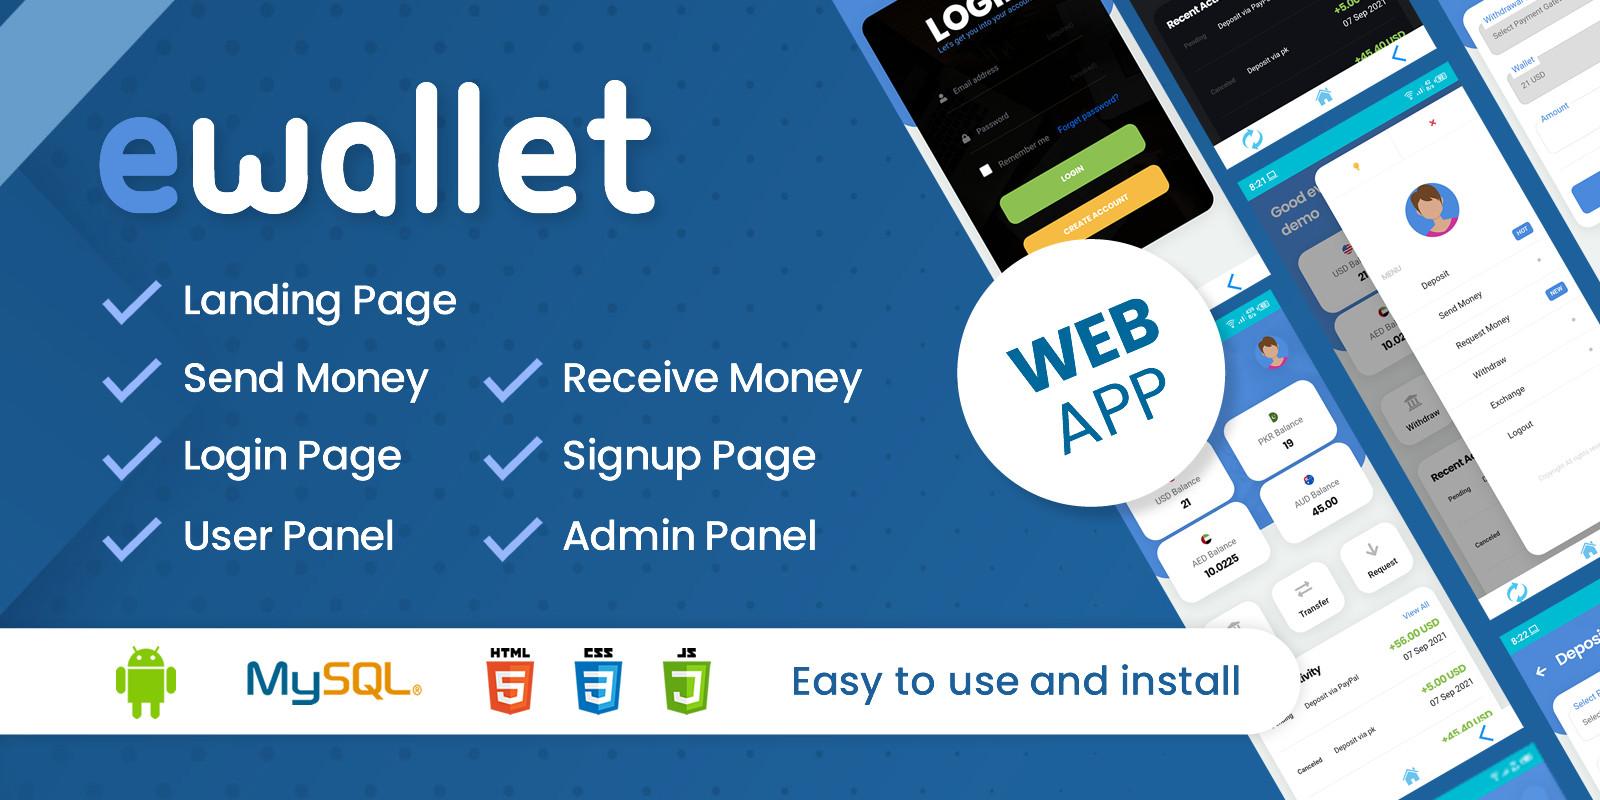 eWallet Android Web App